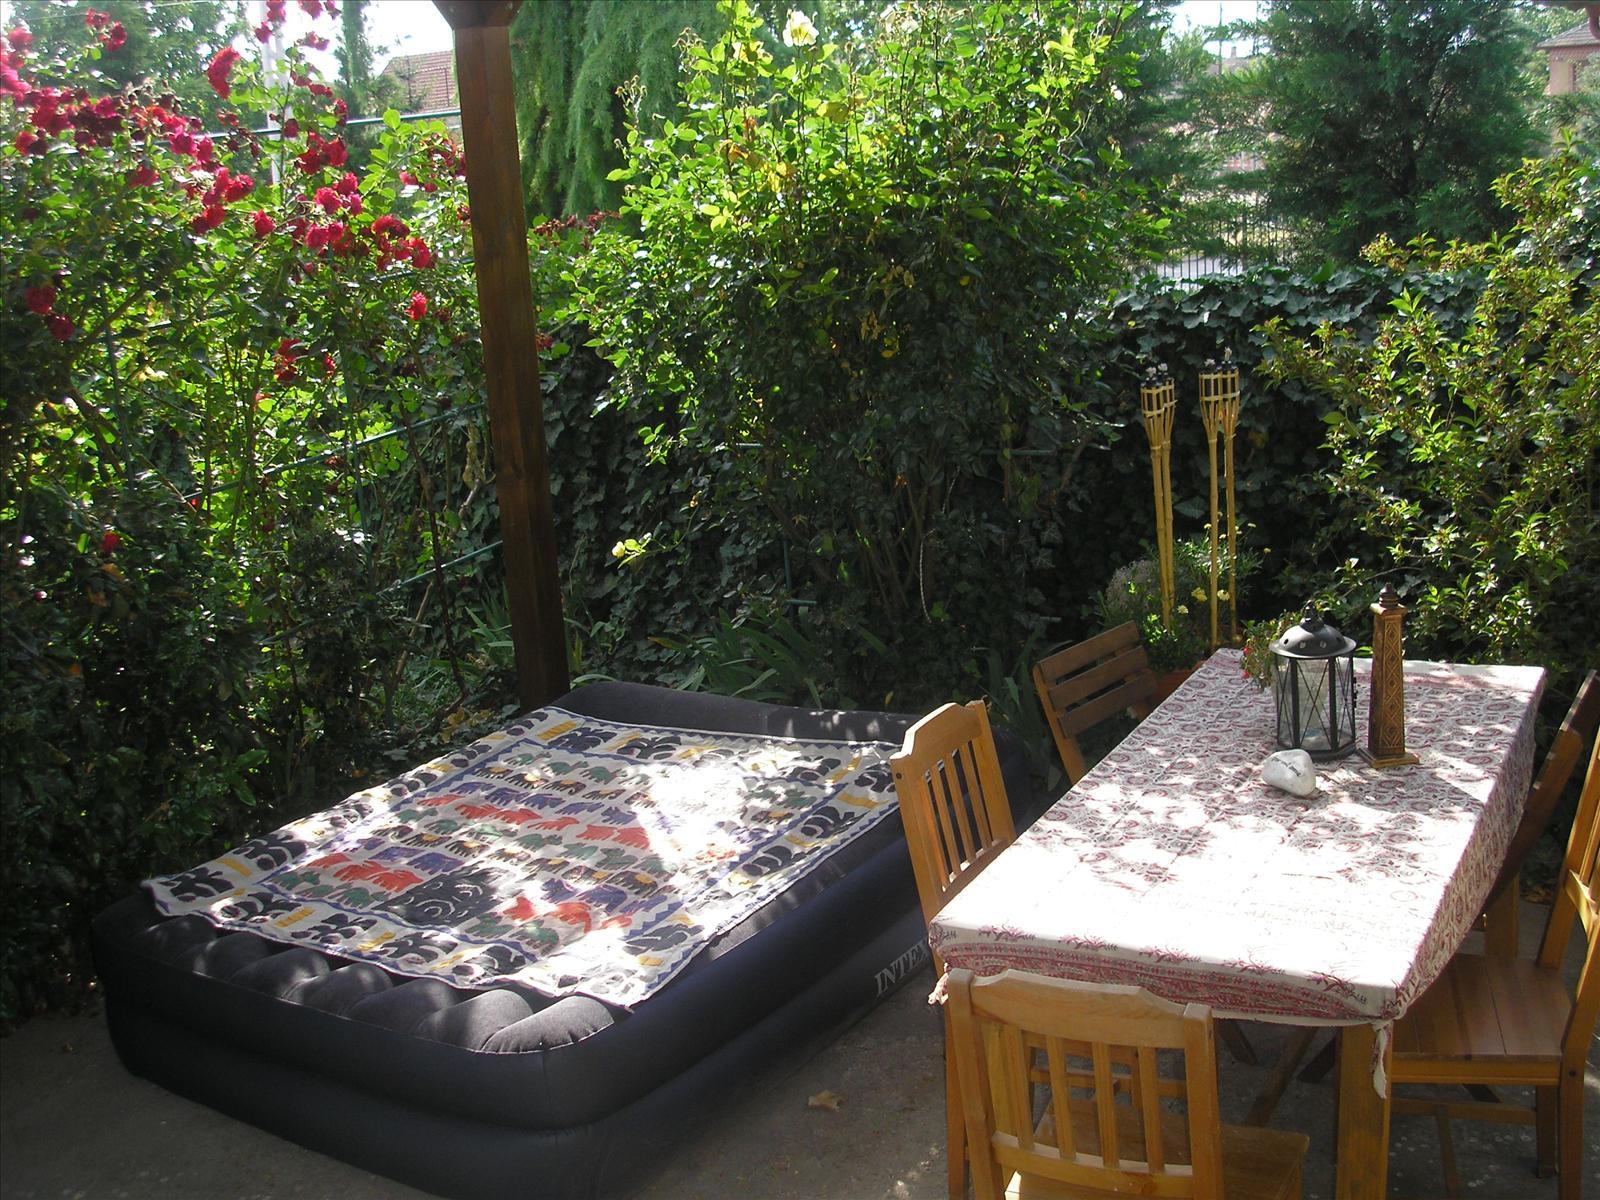 Balkong/Altan planering - Trädgård - Feng shui iFokus